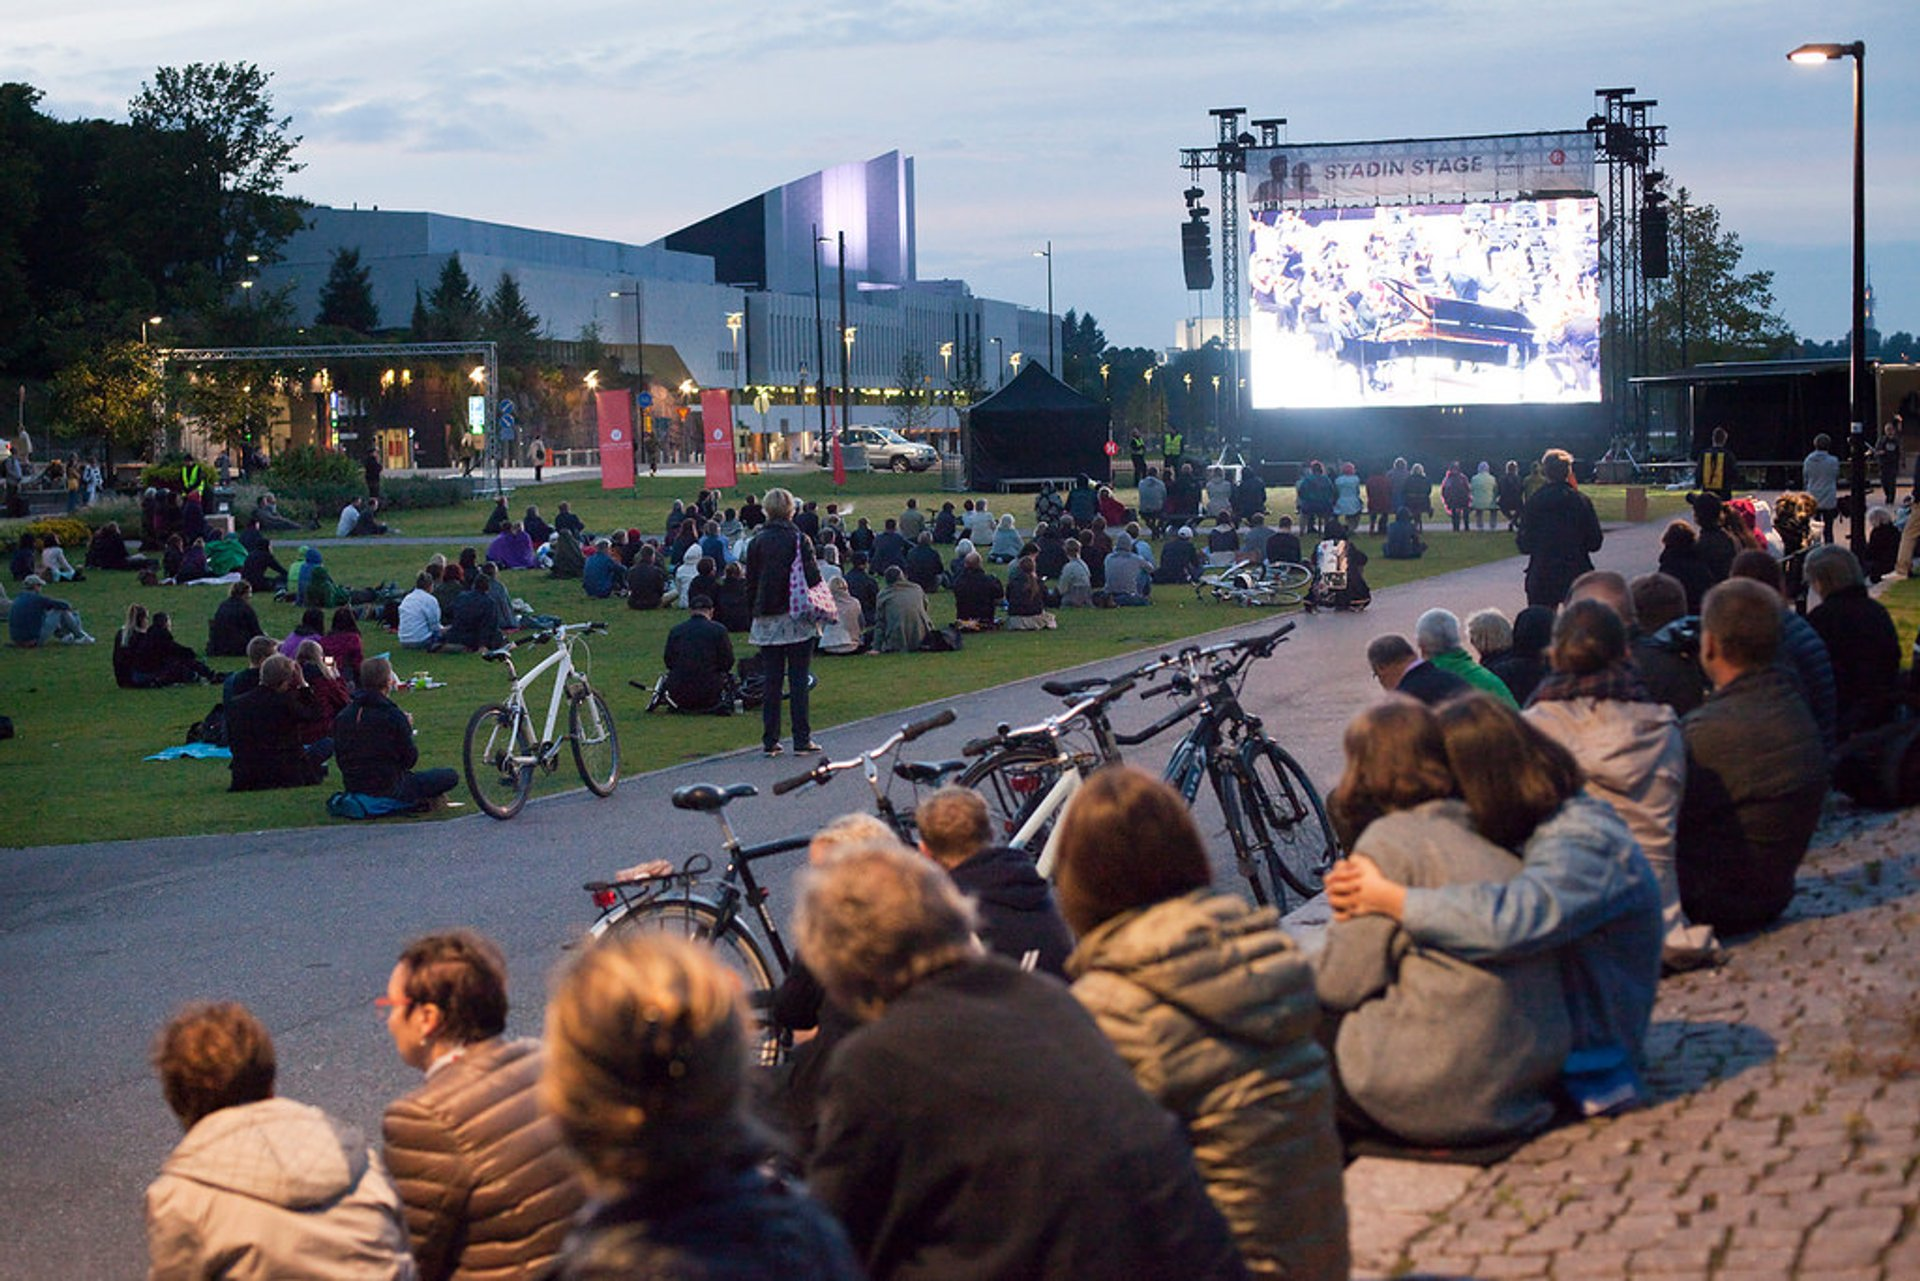 Best time for Helsinki Festival in Finland 2020